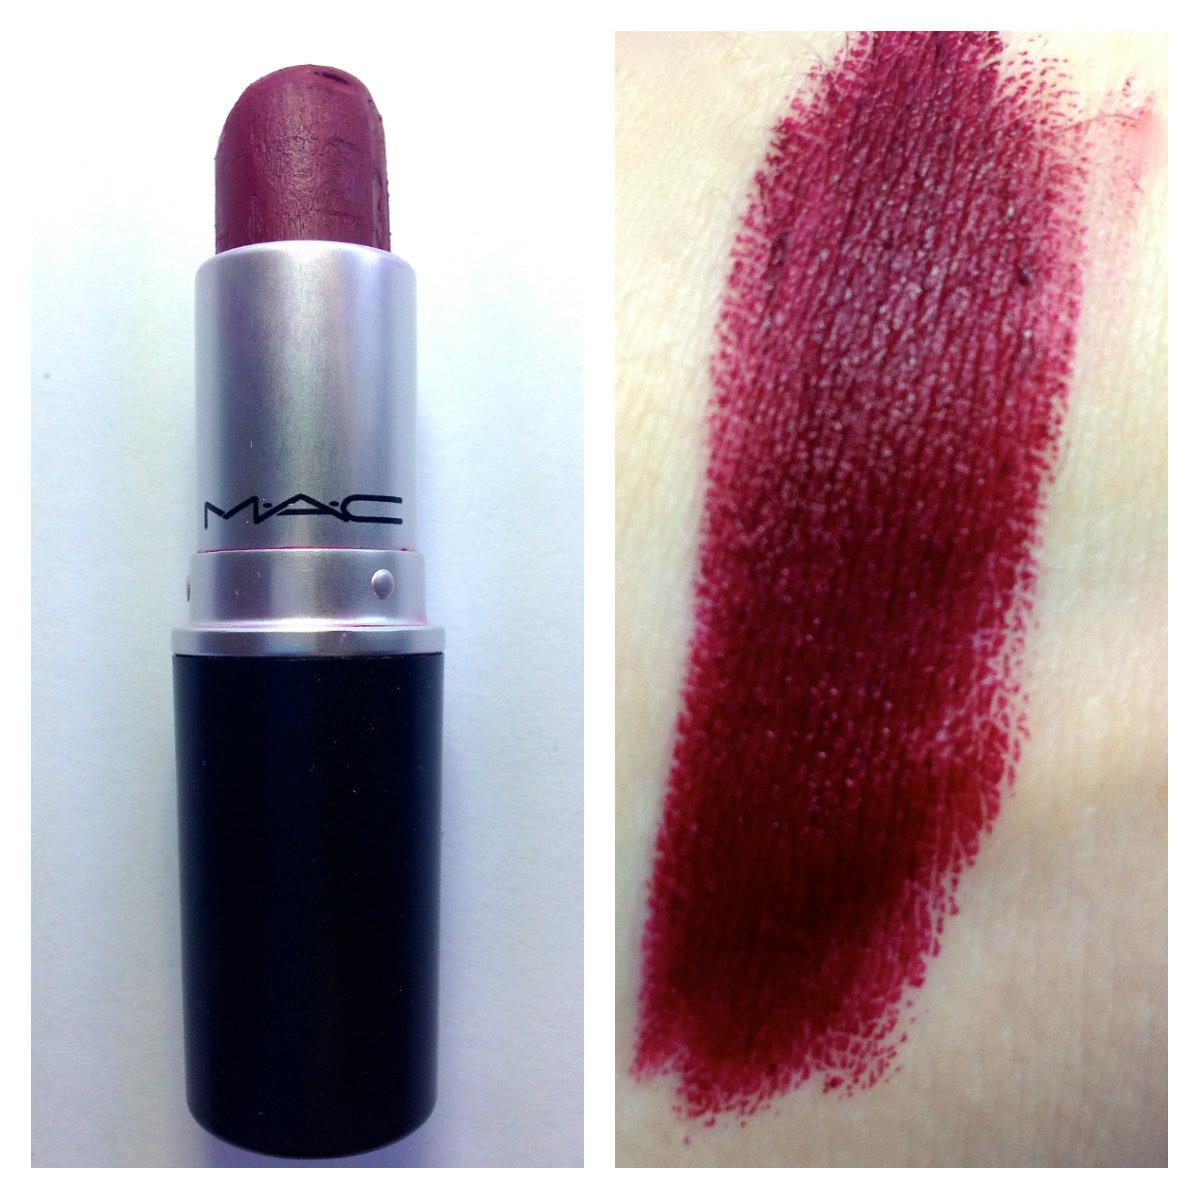 Basics By Morgan: MAC Diva Lipstick